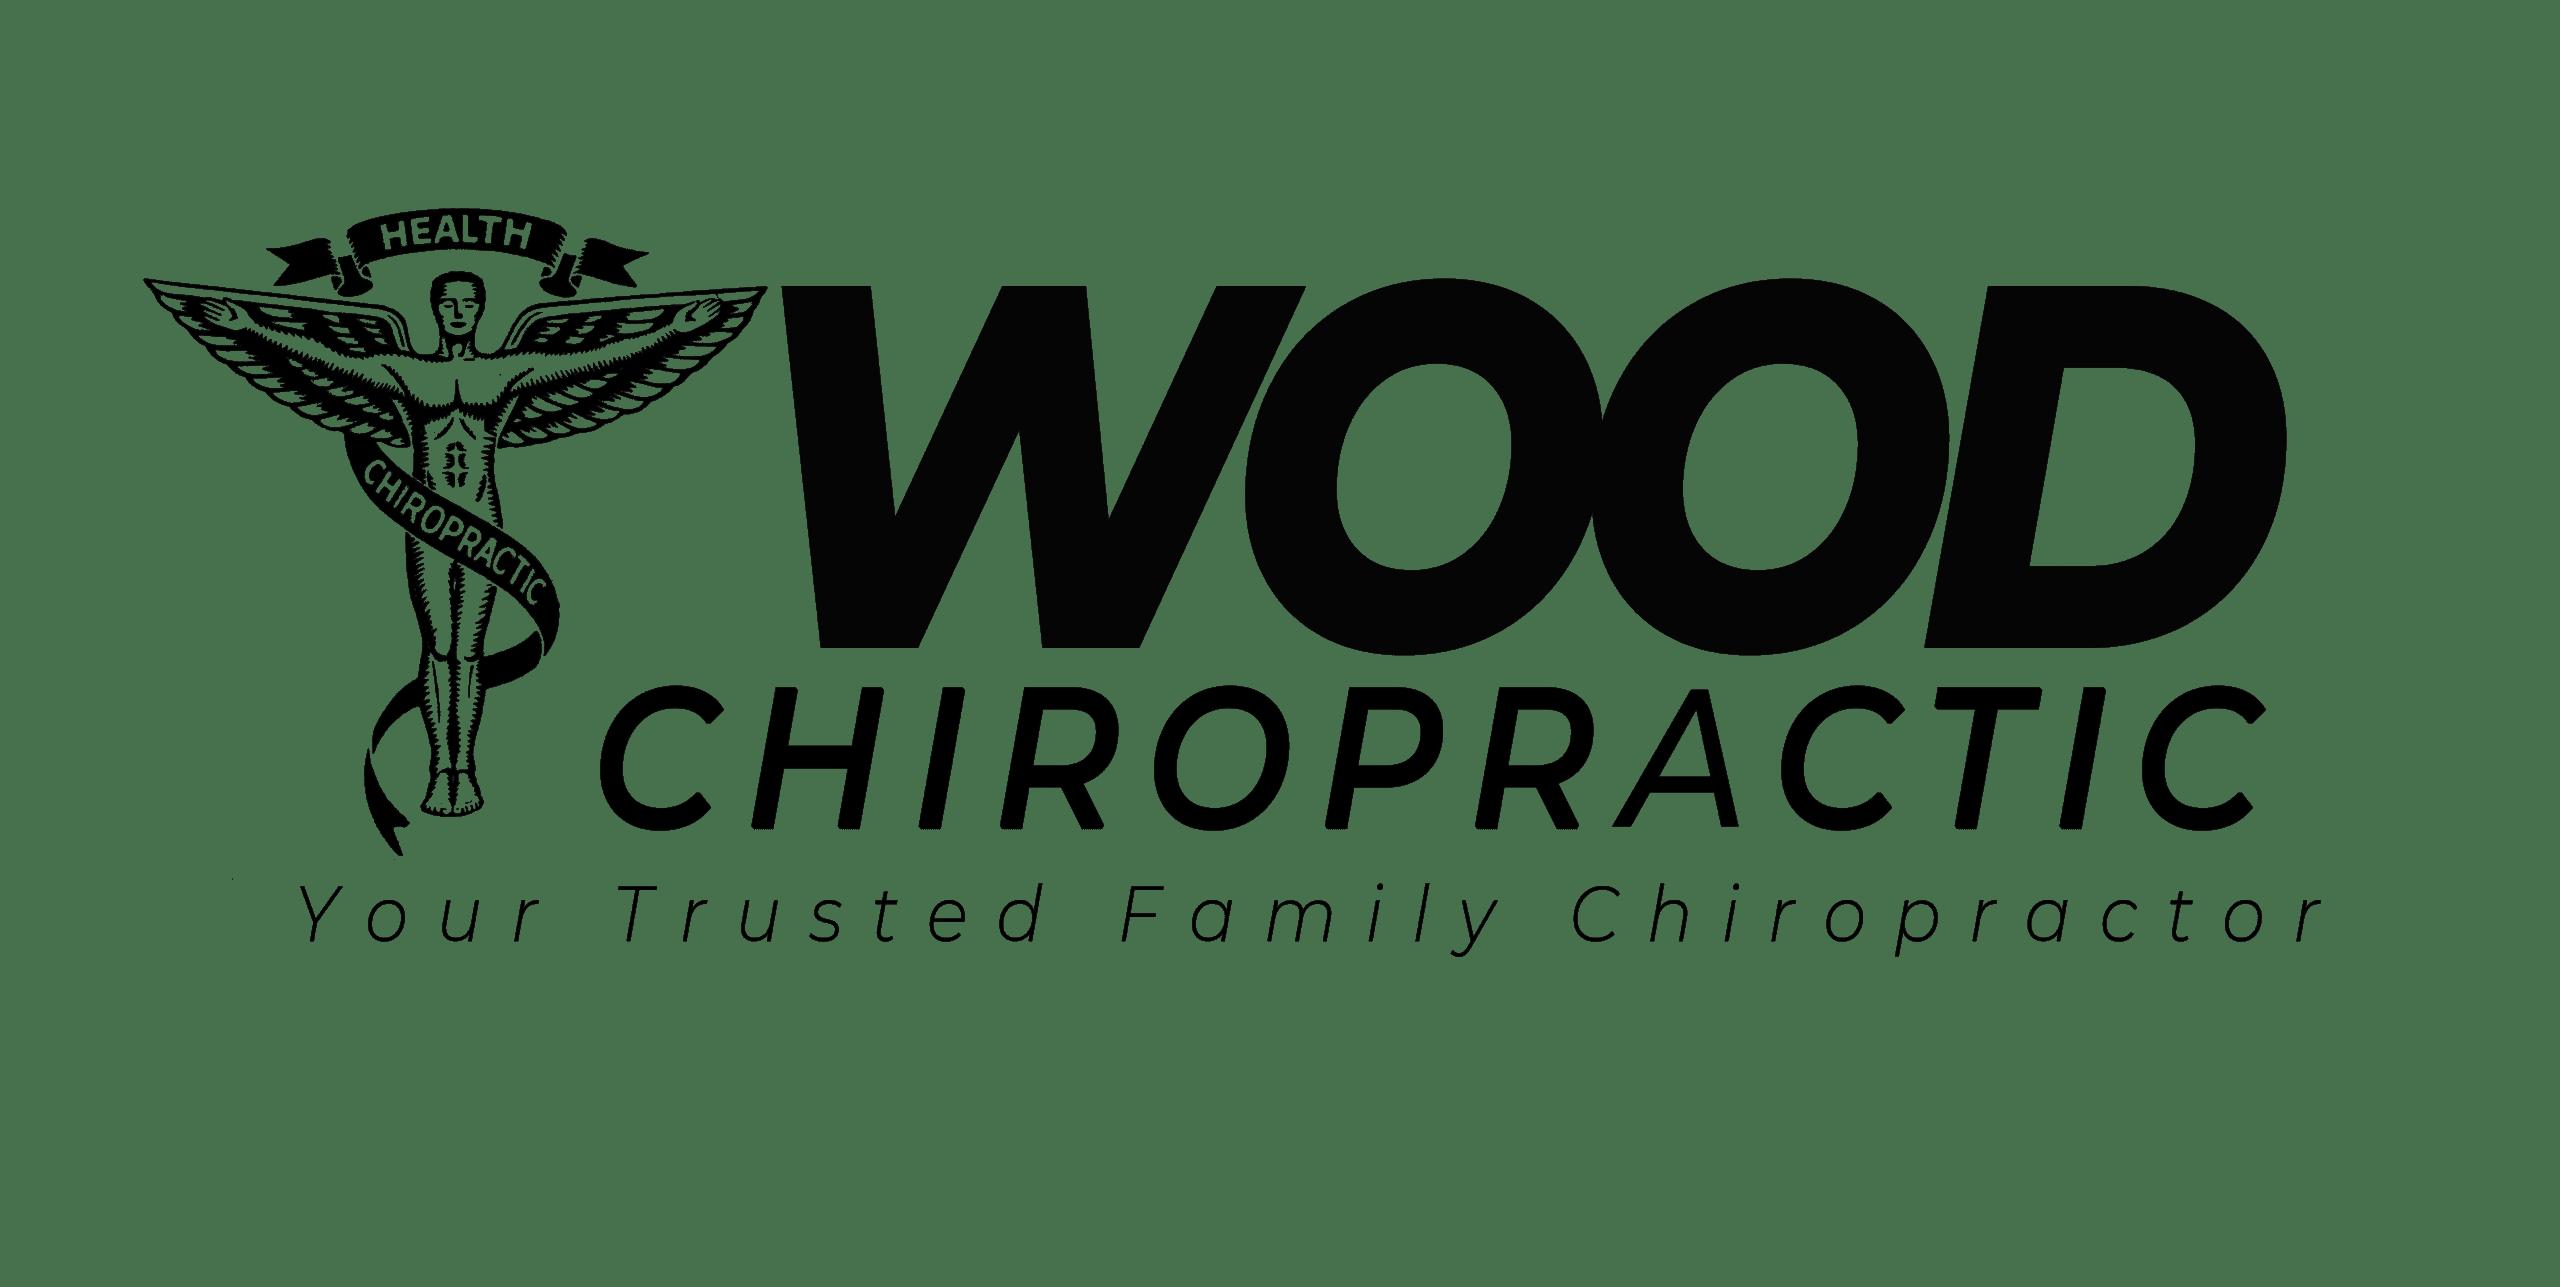 Wood Chiropractic, Durango CO